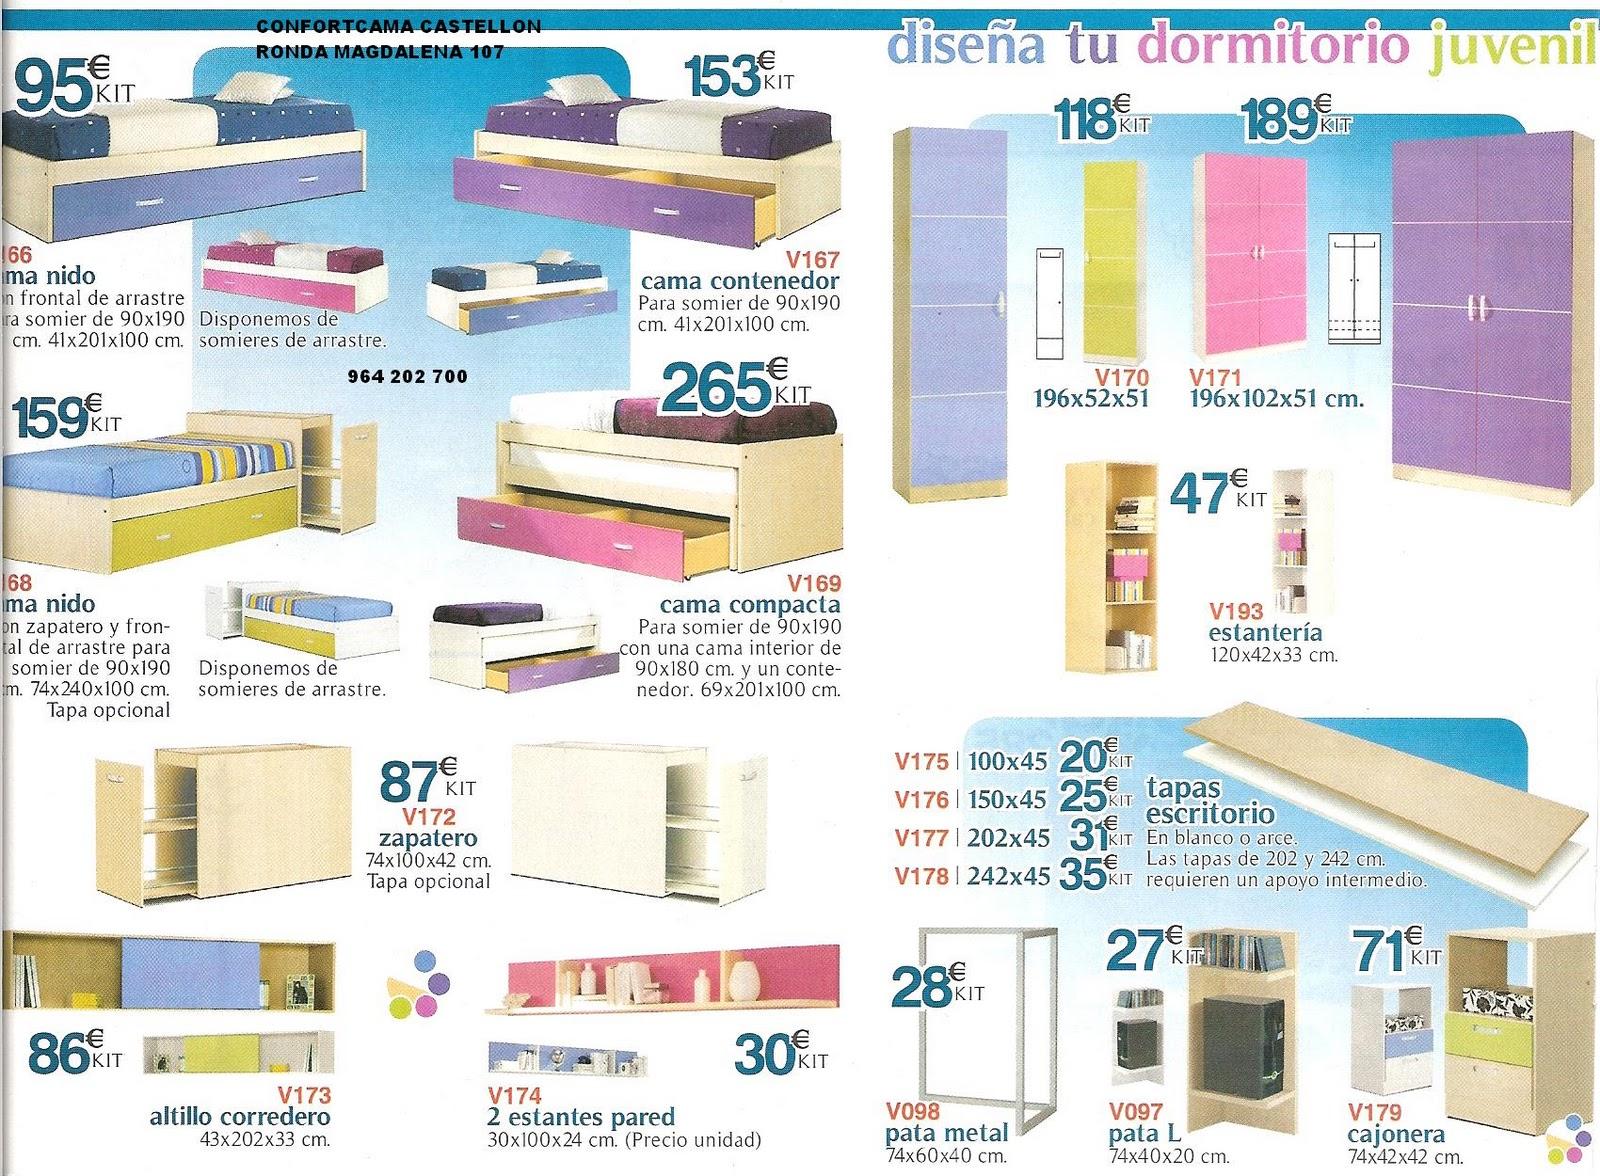 Muebles oferta kit dise a tu propio dormitorio juvenil for Ofertas de dormitorios juveniles